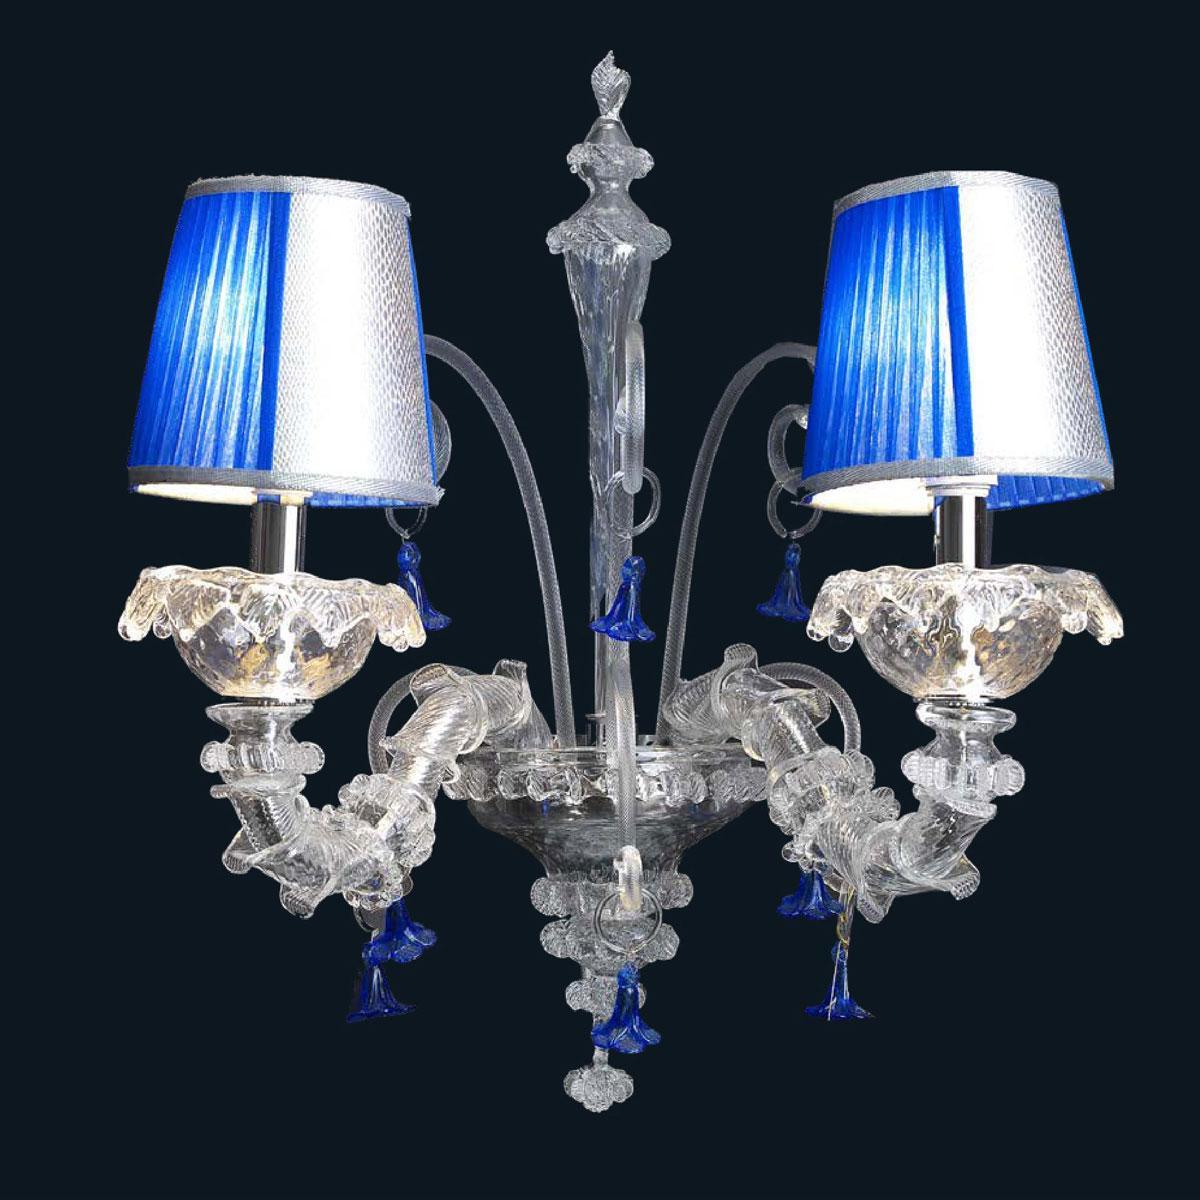 """Julien"" Murano glass sconce - 2 lights - transparent and blue"